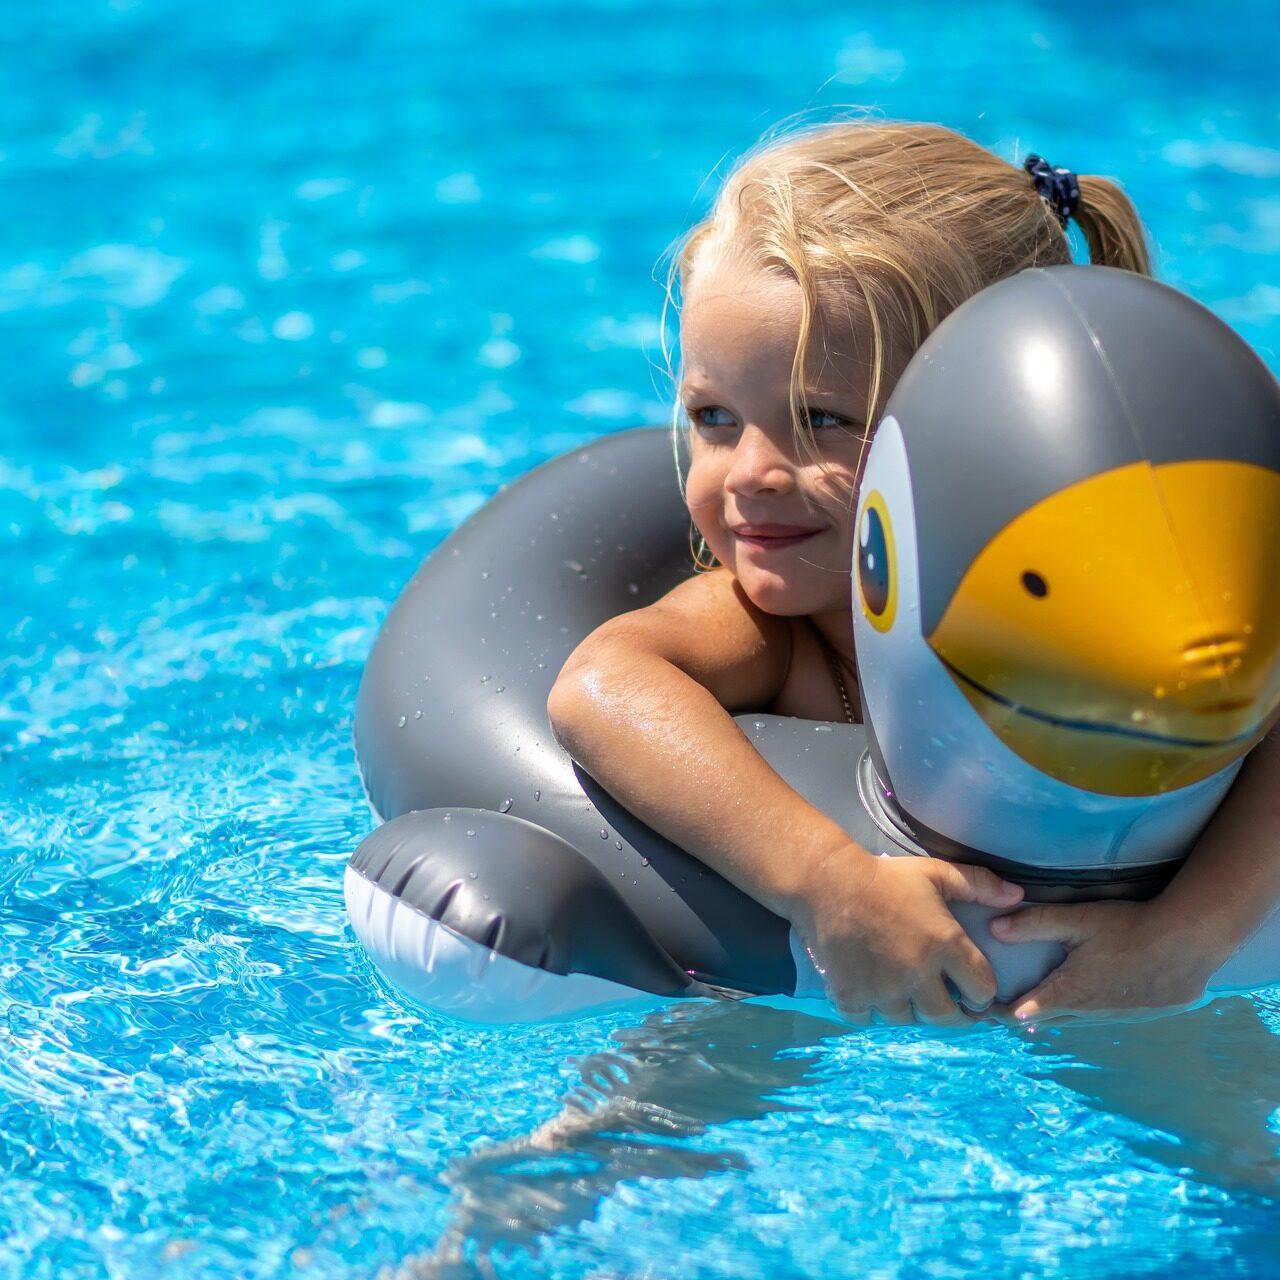 swimming-pool-3567607_1920